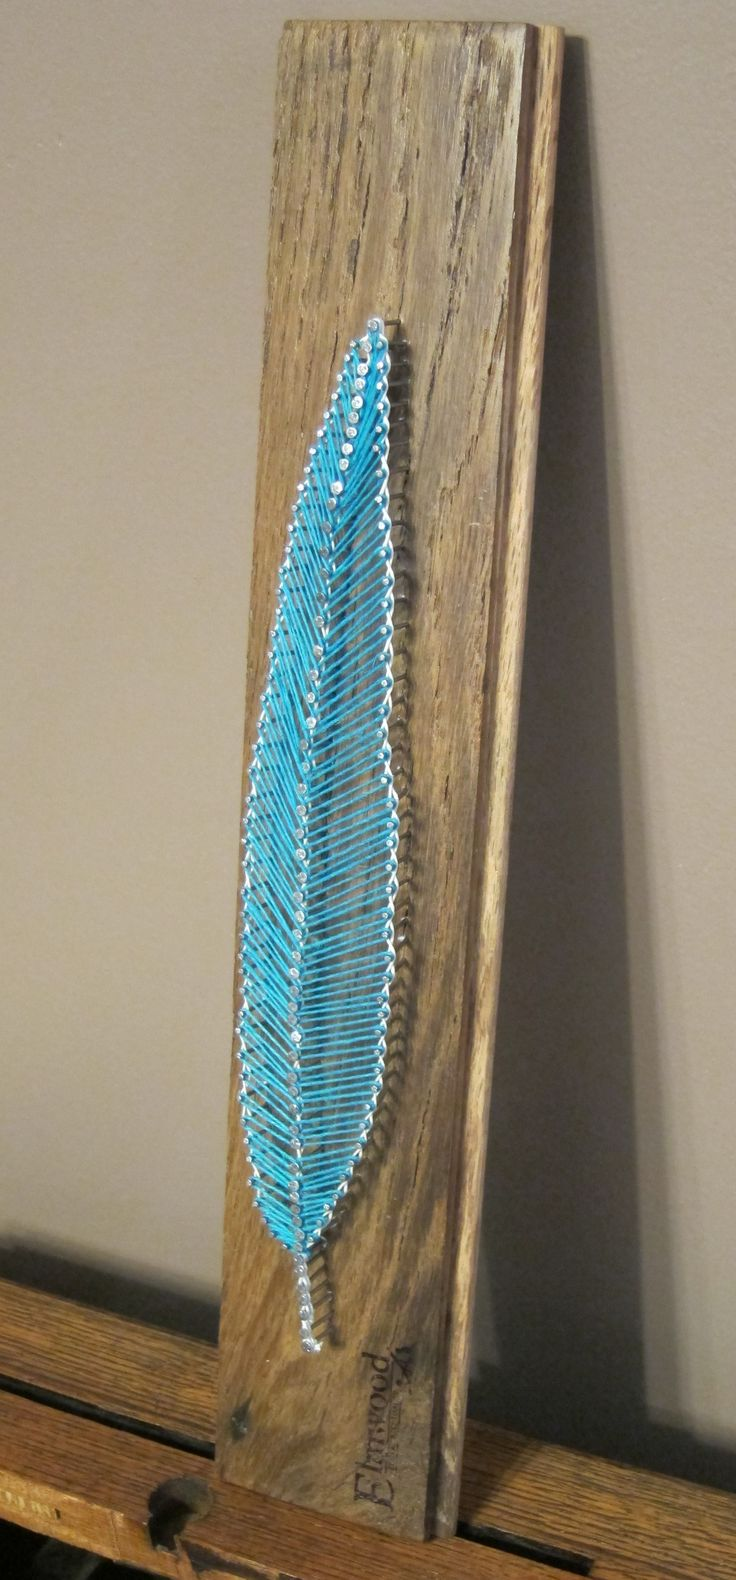 122 best images about string art on pinterest nail. Black Bedroom Furniture Sets. Home Design Ideas